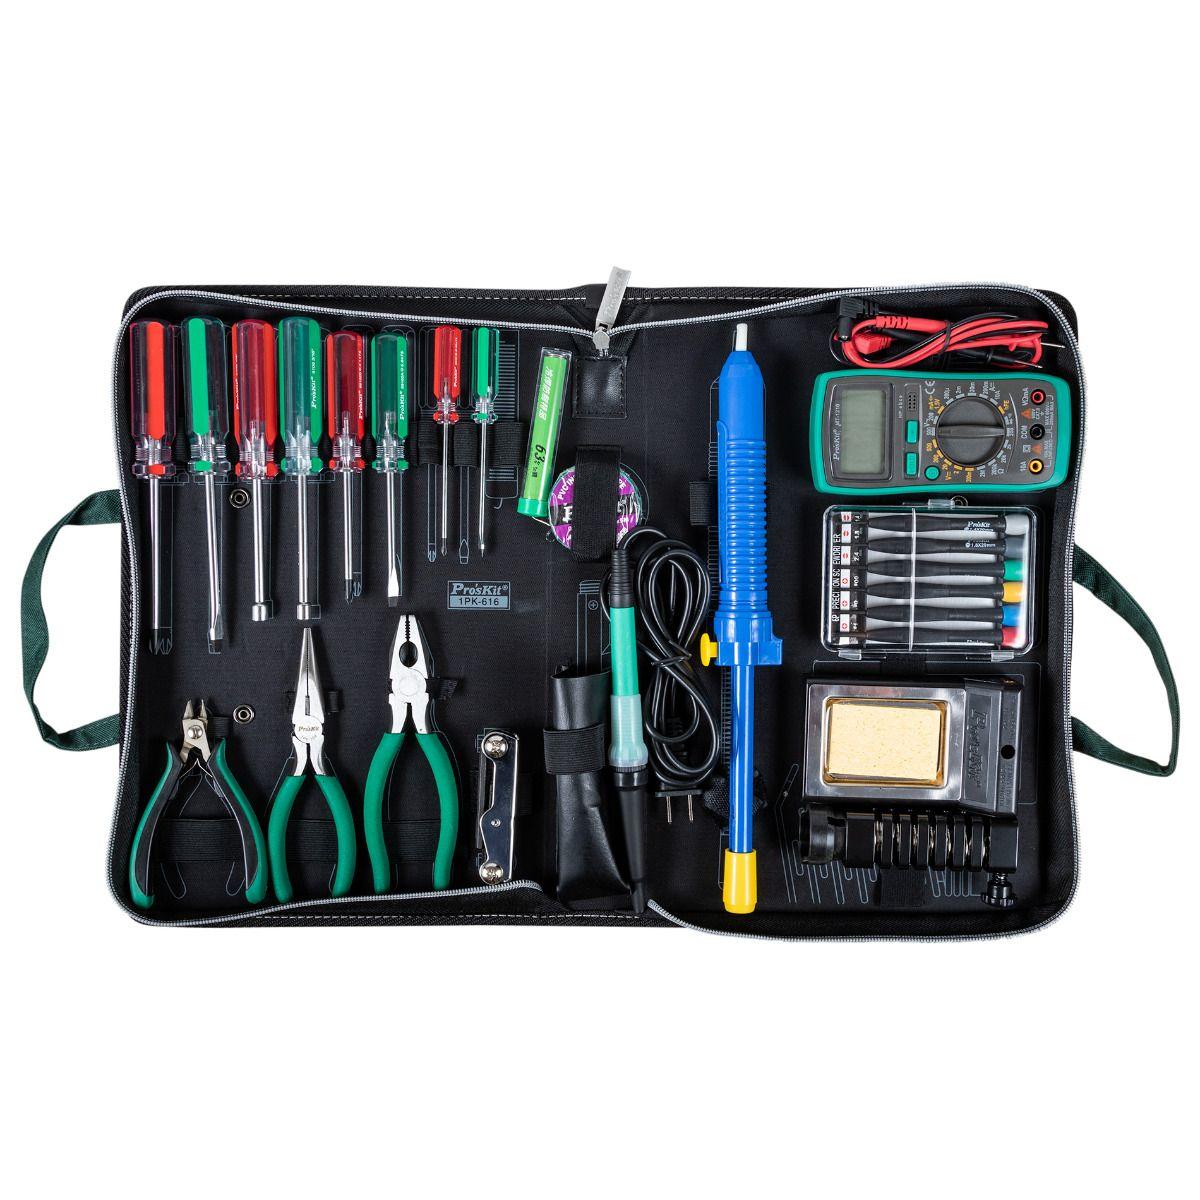 Professional Electronics Tool Kit